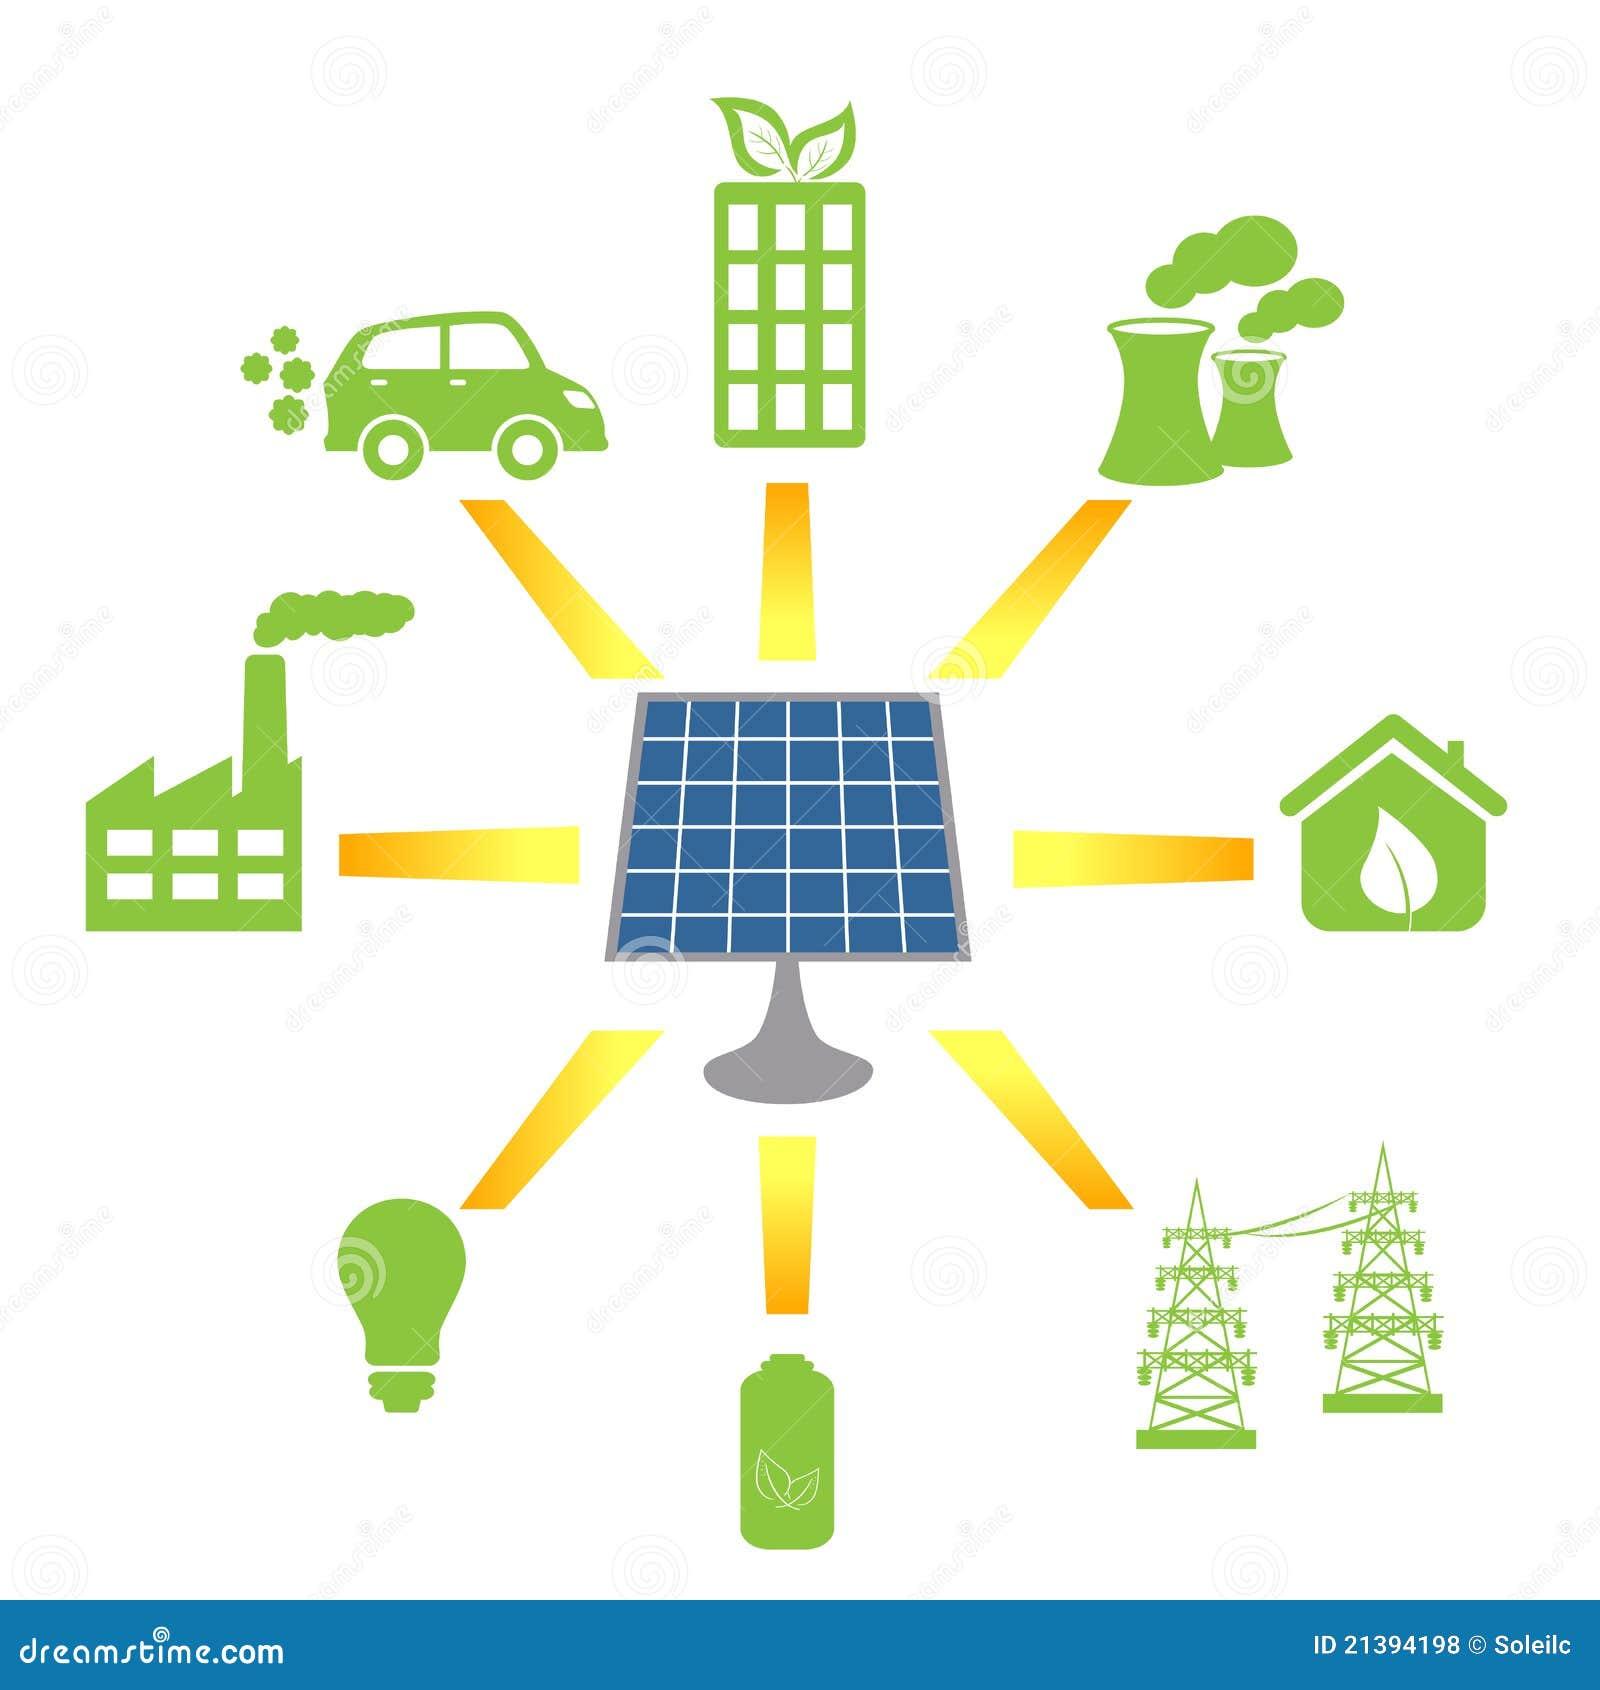 Solar panel farm business plan